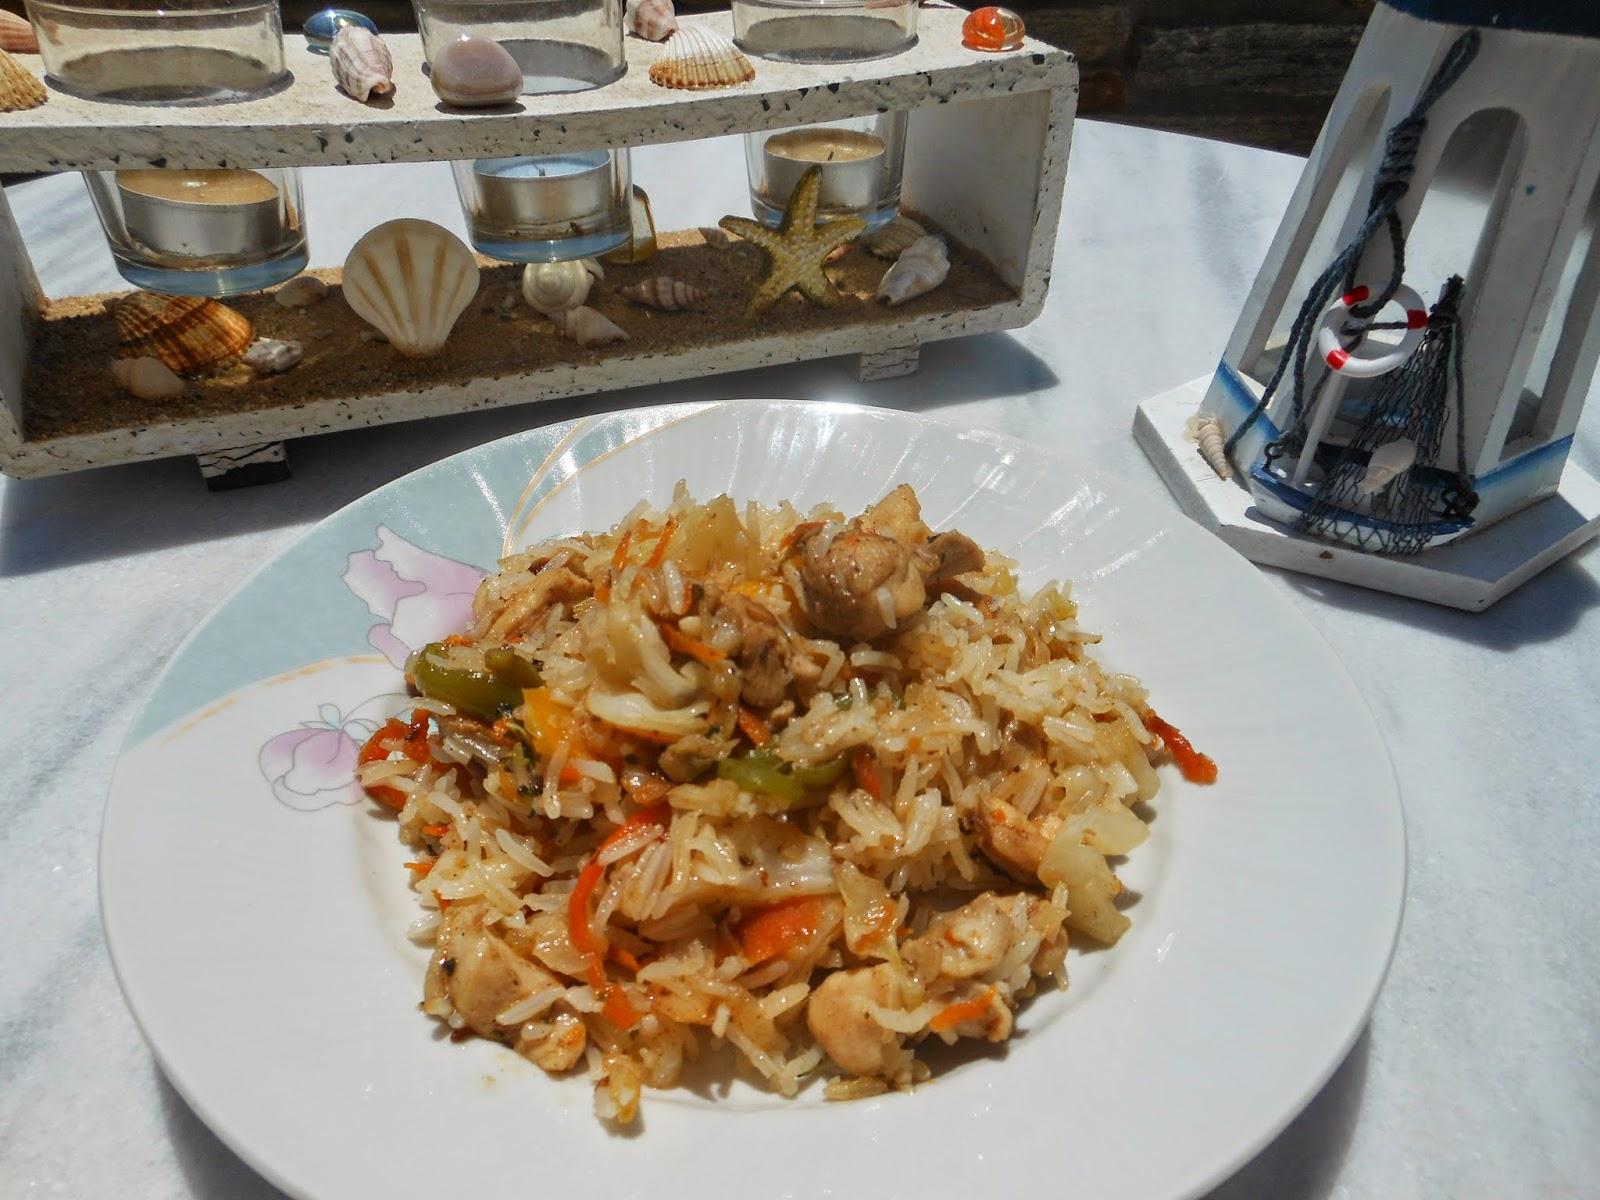 Koτόπουλο  με  ρύζι  και  λαχανικά